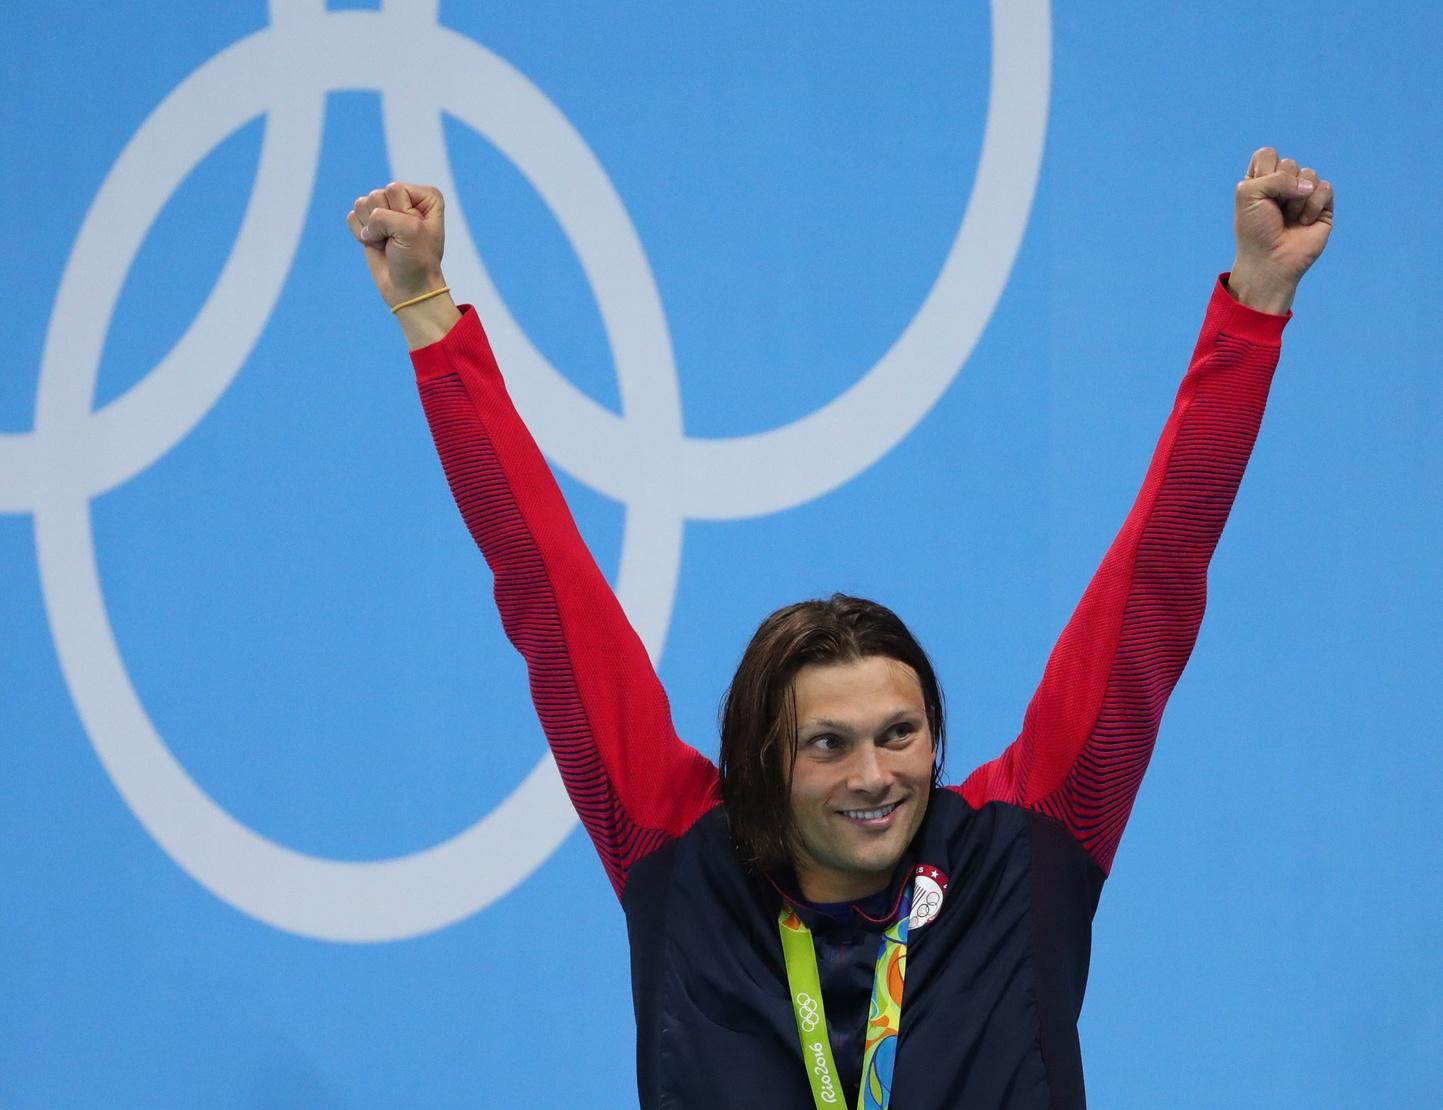 Cody Miller Receives Keys To Las Vegas & Las Vegas Strip, Has Day Named After Him - Swimming World News